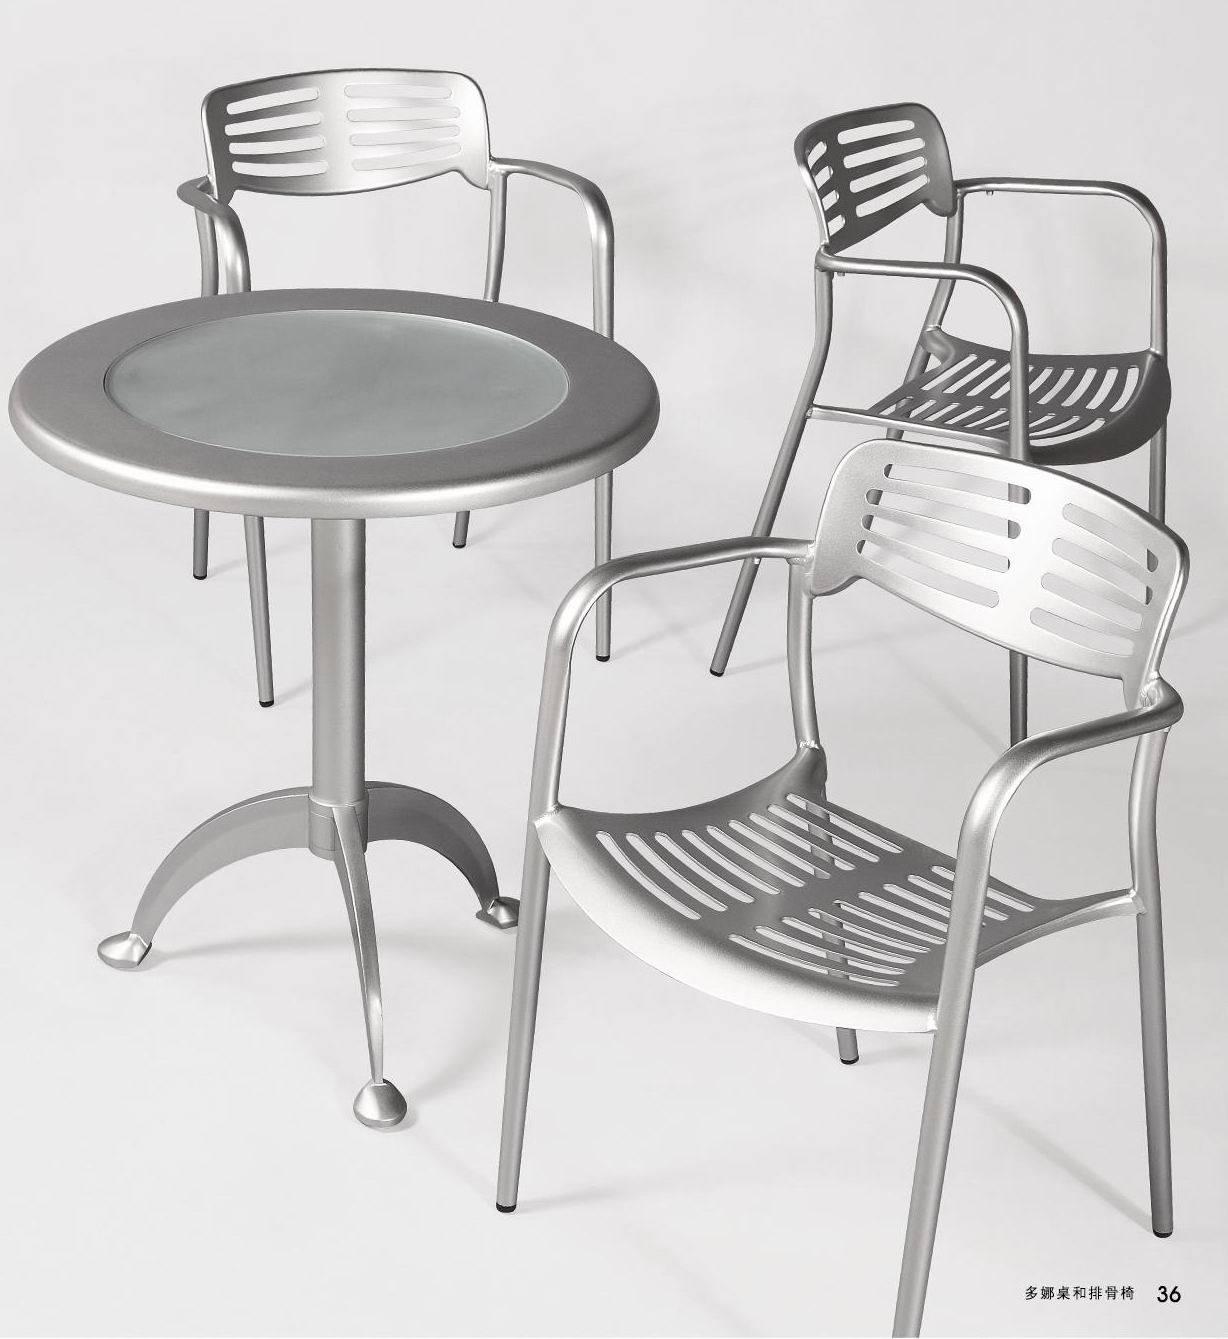 Aluminio muebles de terraza aluminio muebles de terraza for Muebles de aluminio